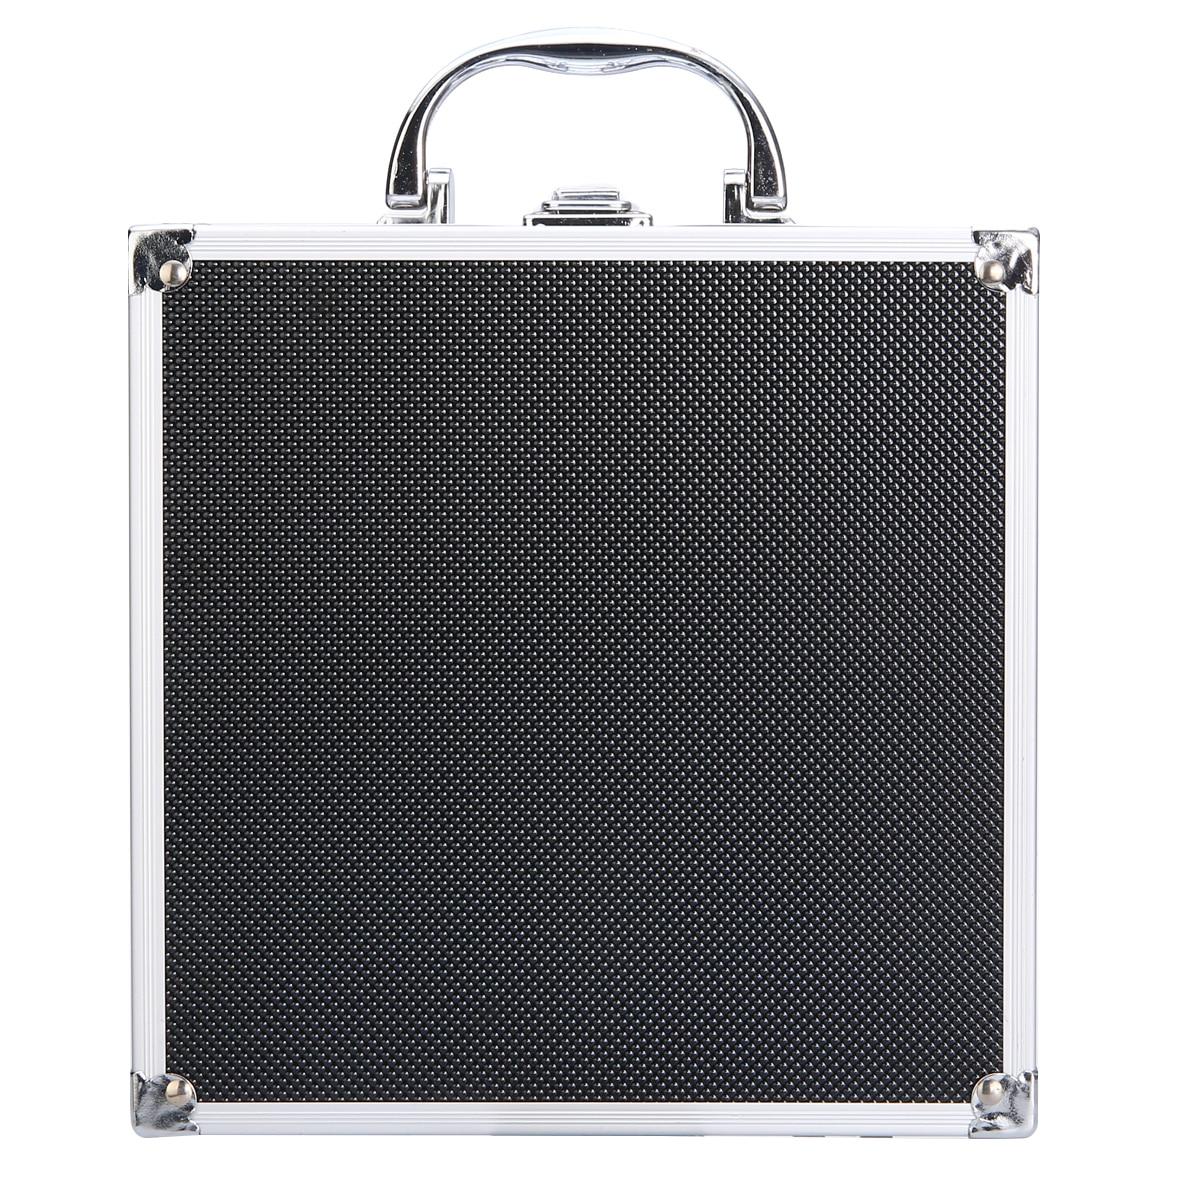 Black Aluminum Alloy Tool Box Case Handheld Tool Storage Suitcase Box Anti Crash+Sponge Durable Flight Case Organizer Potable